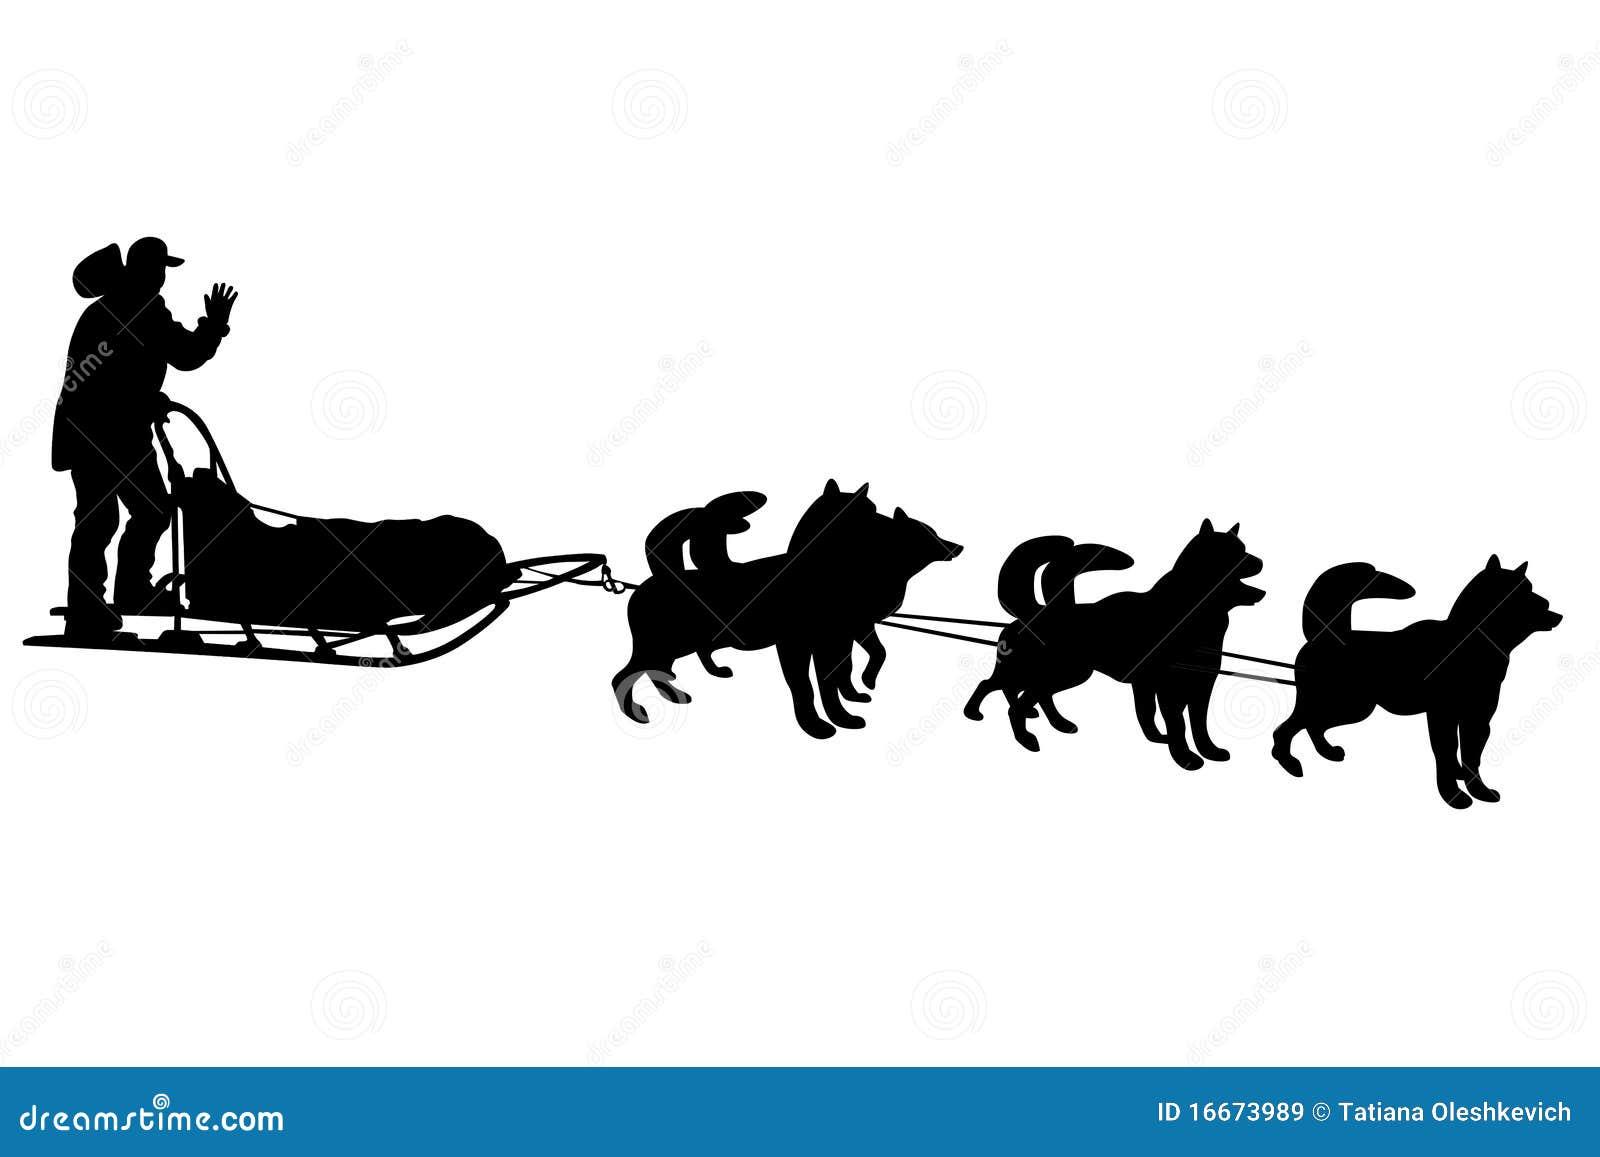 Dog Sled Silhouettes Royalty Free Stock Images - Image: 16673989